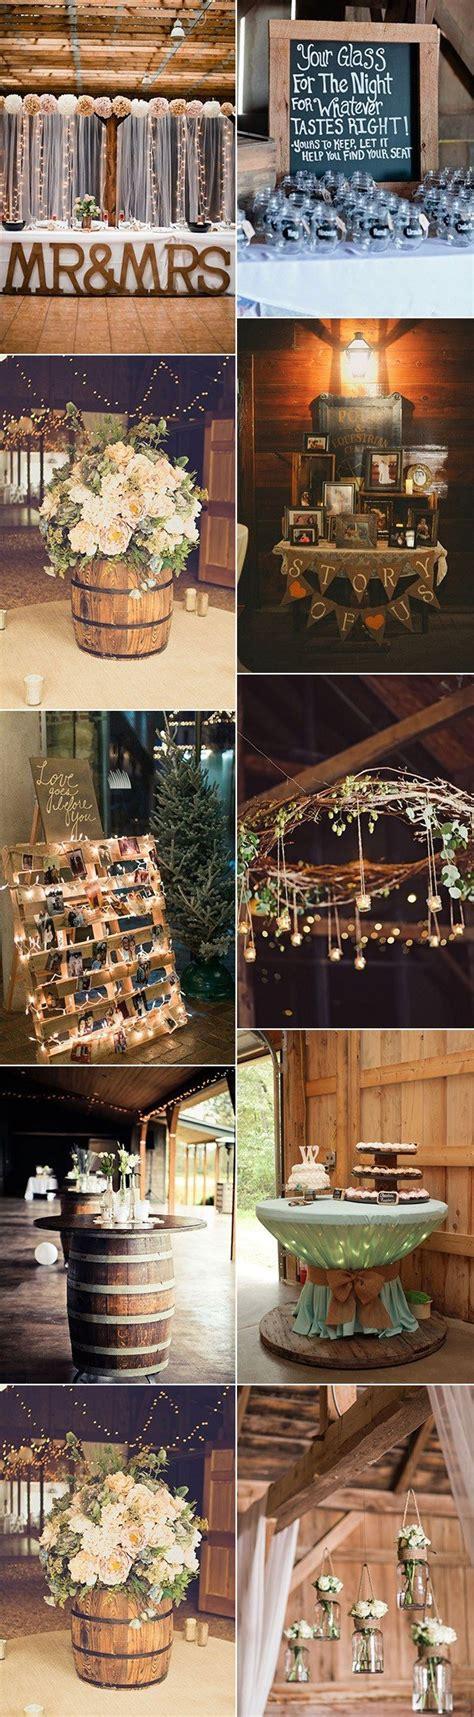 rustic barn wedding decoration ideas 18 country rustic barn wedding decoration ideas